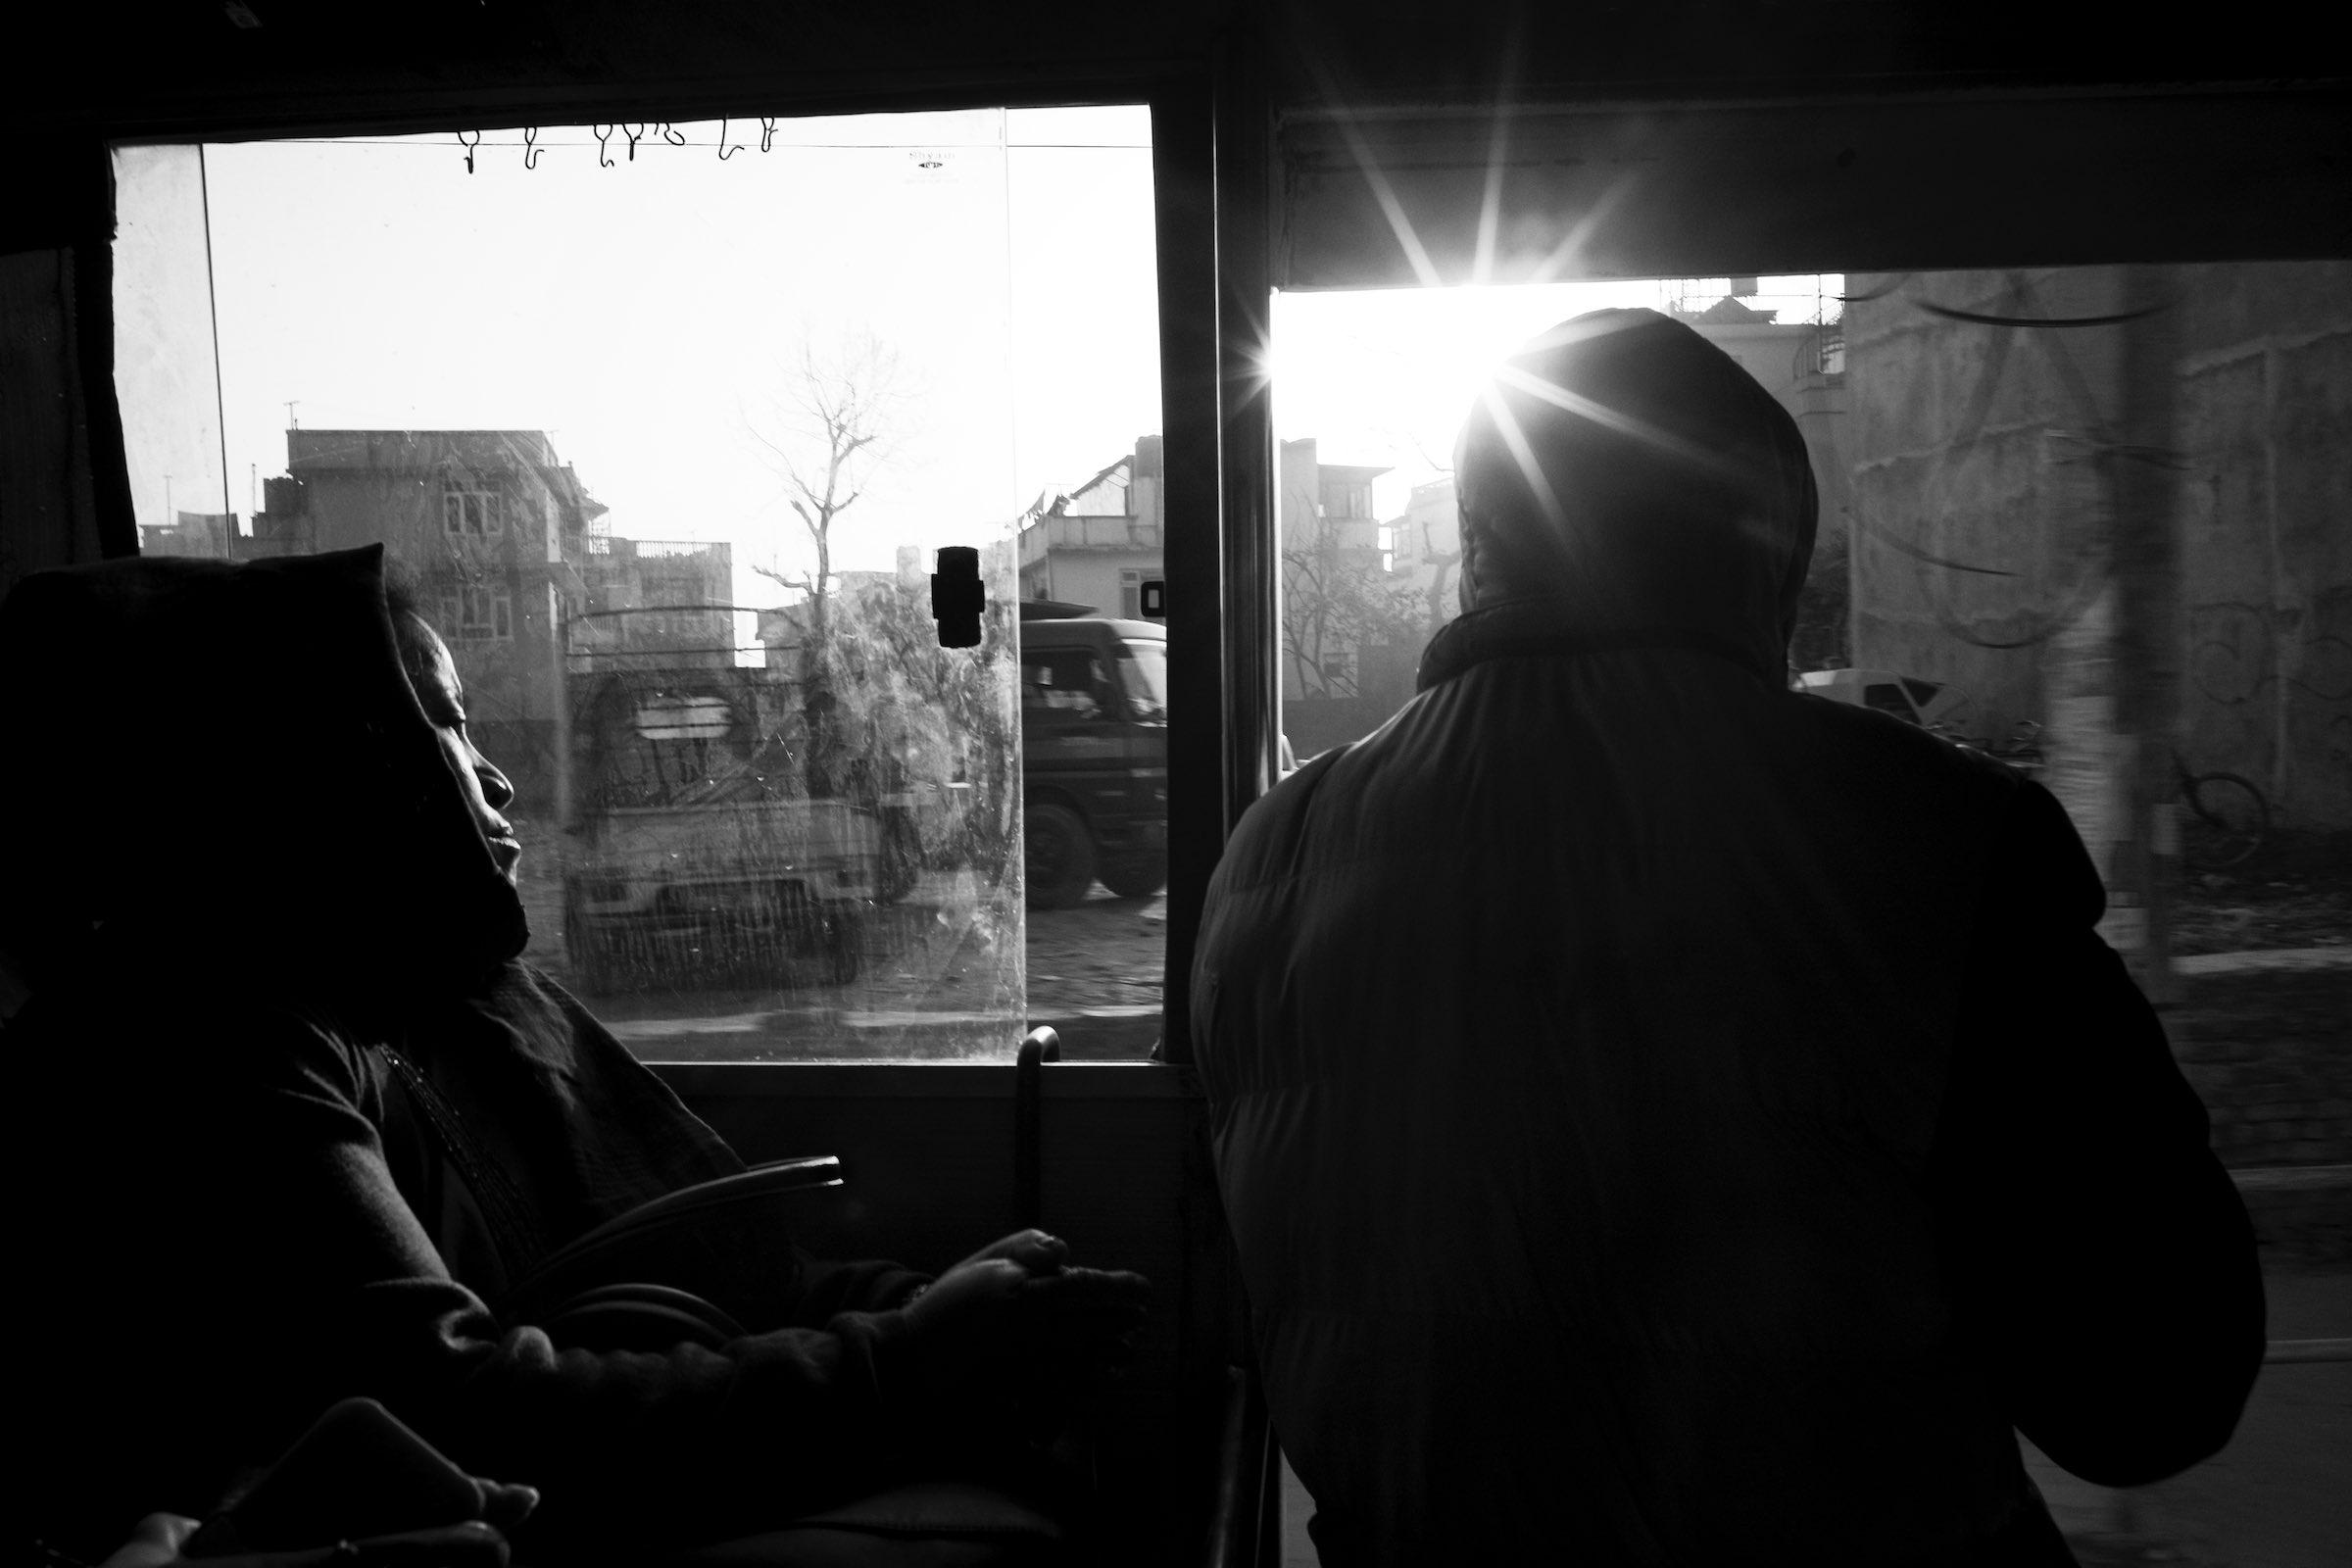 bus03.jpg